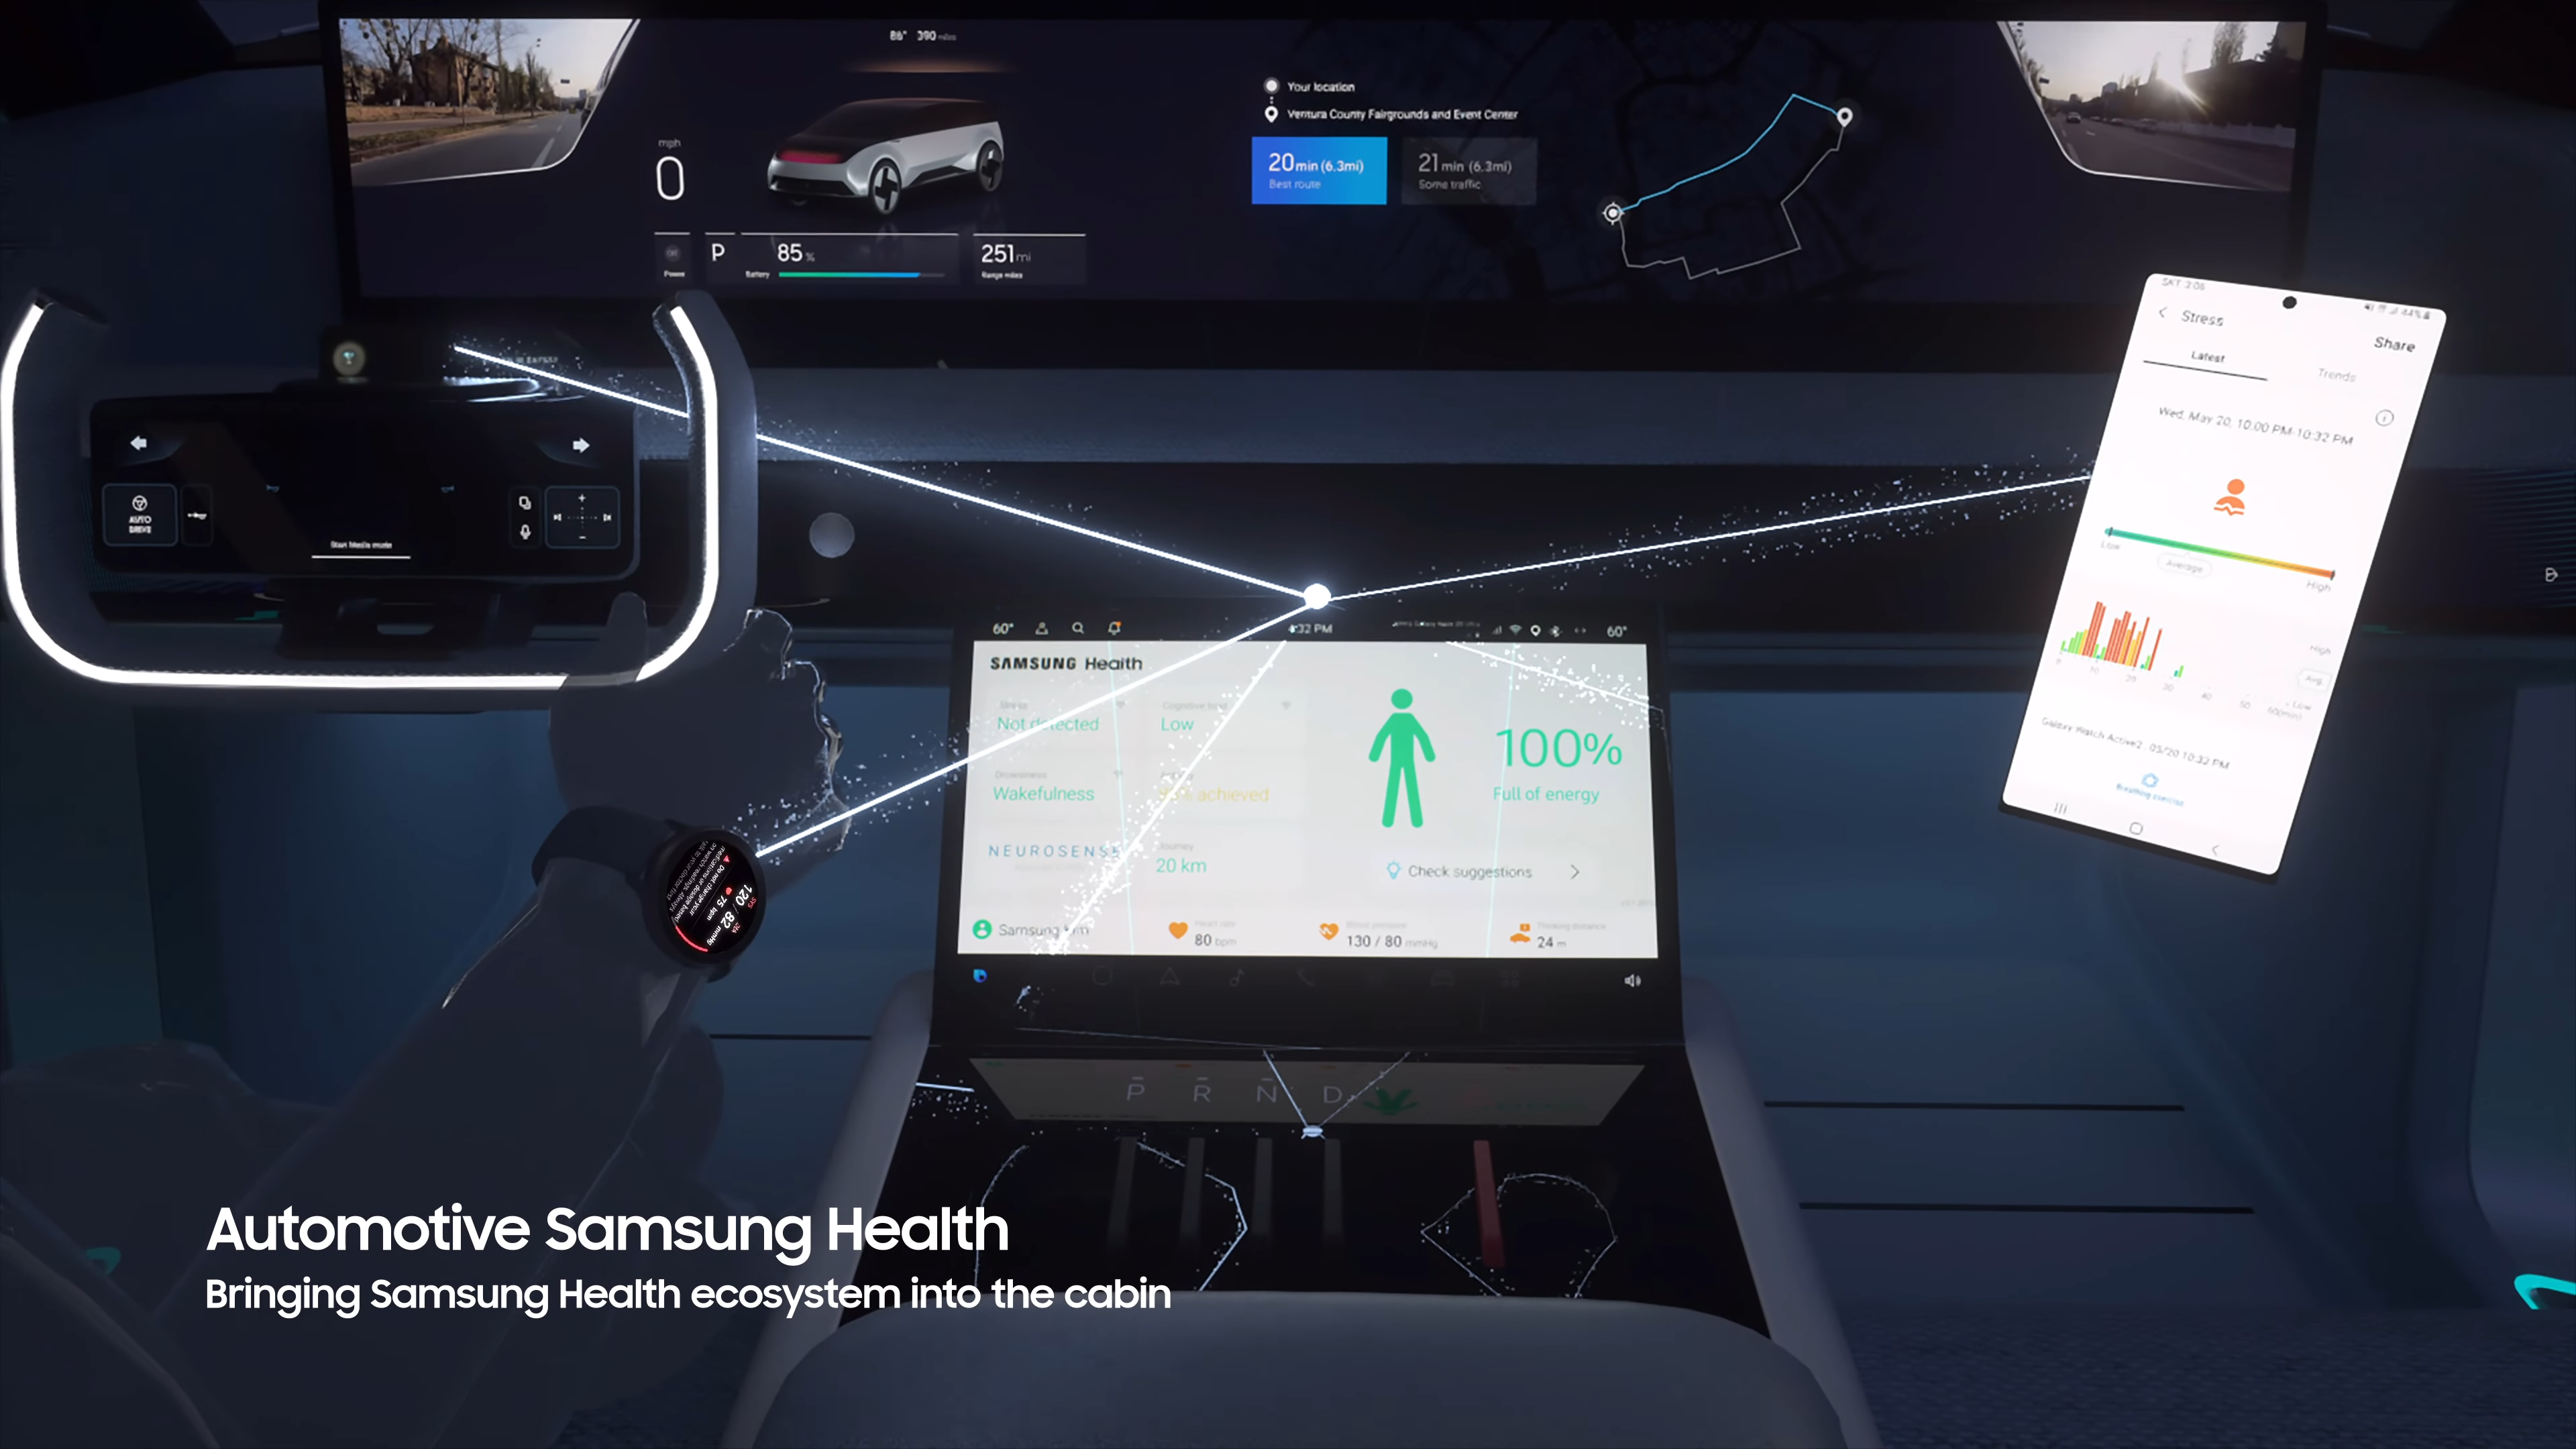 Samsung Digital Cockpit 2021 Samsung Health Sync Driver Fatigue